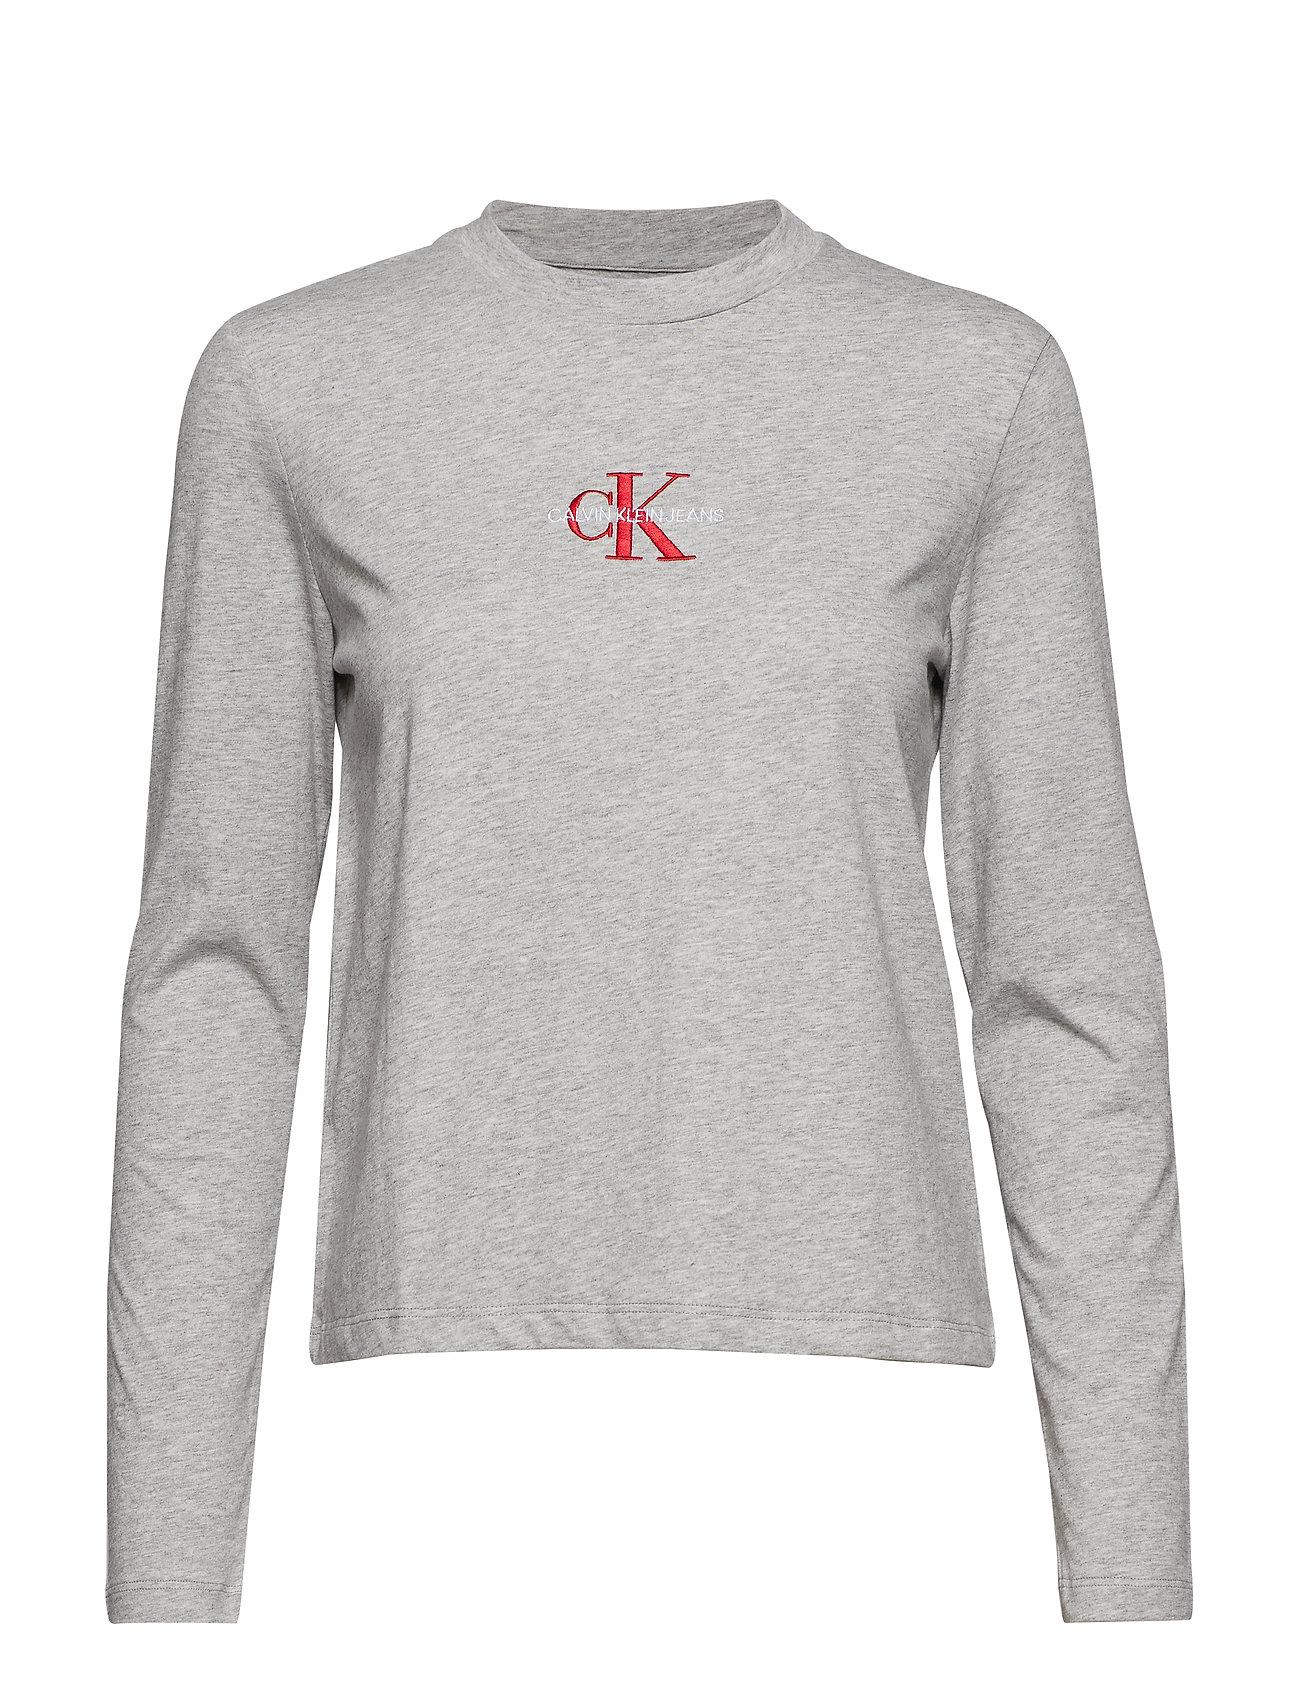 Calvin Klein Jeans MONOGRAM EMBROIDERY, - LIGHT GREY HEATHER